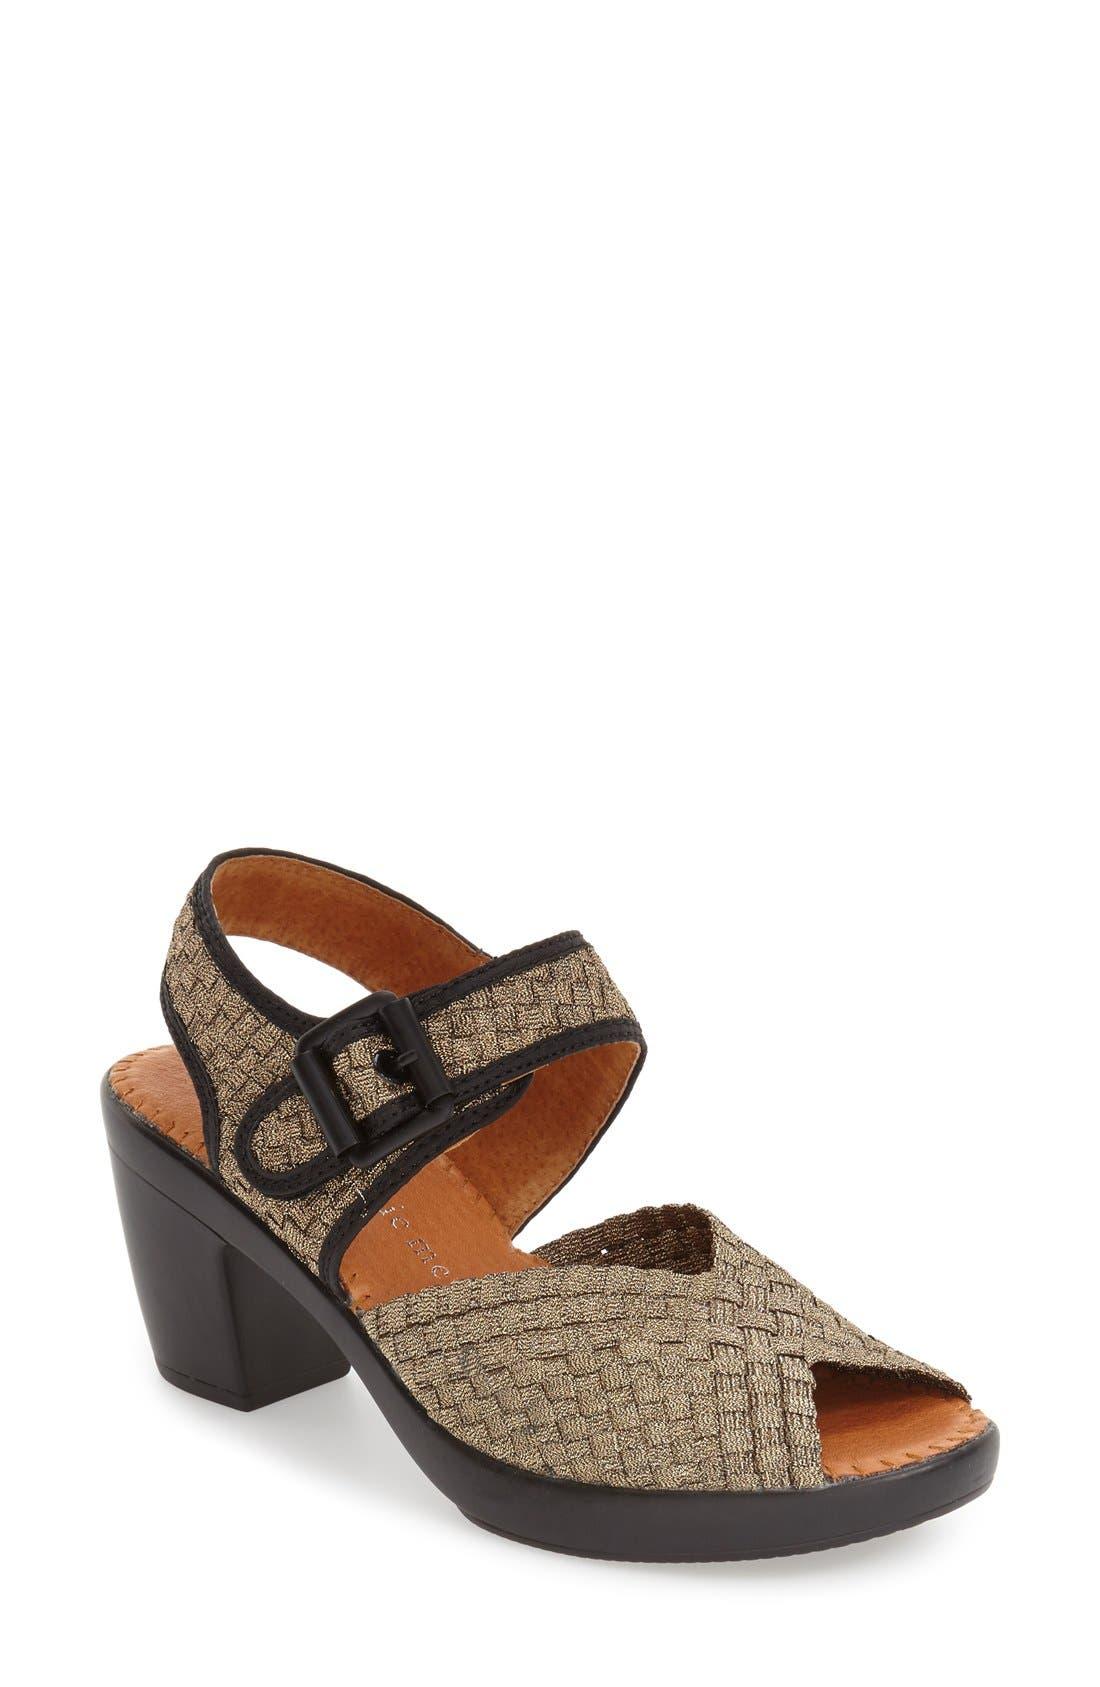 BERNIE MEV. 'Drisco' Platform Sandal